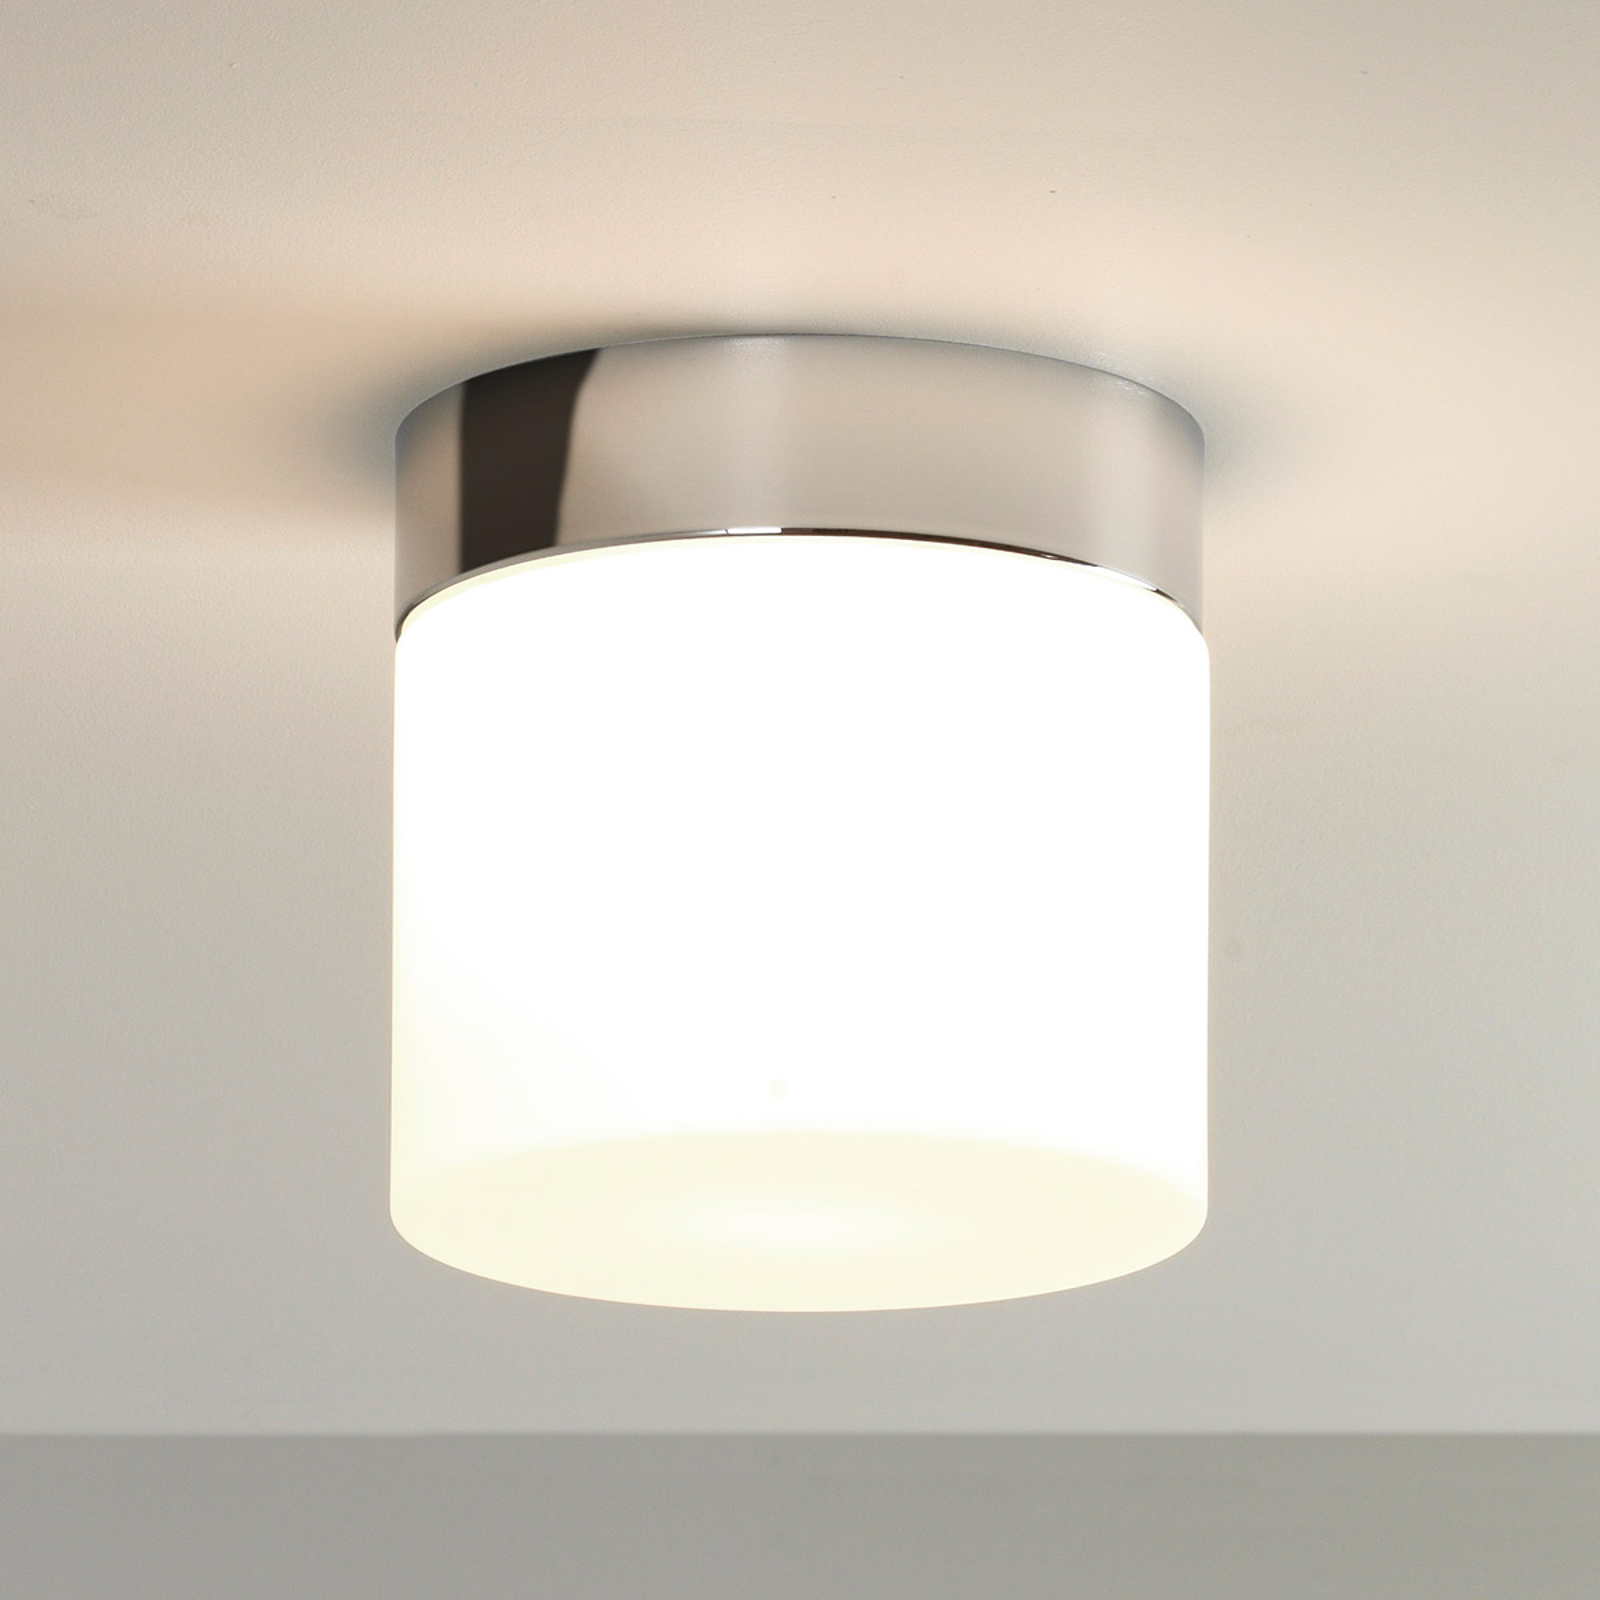 Jasno świecąca lampa sufitowa SABINA